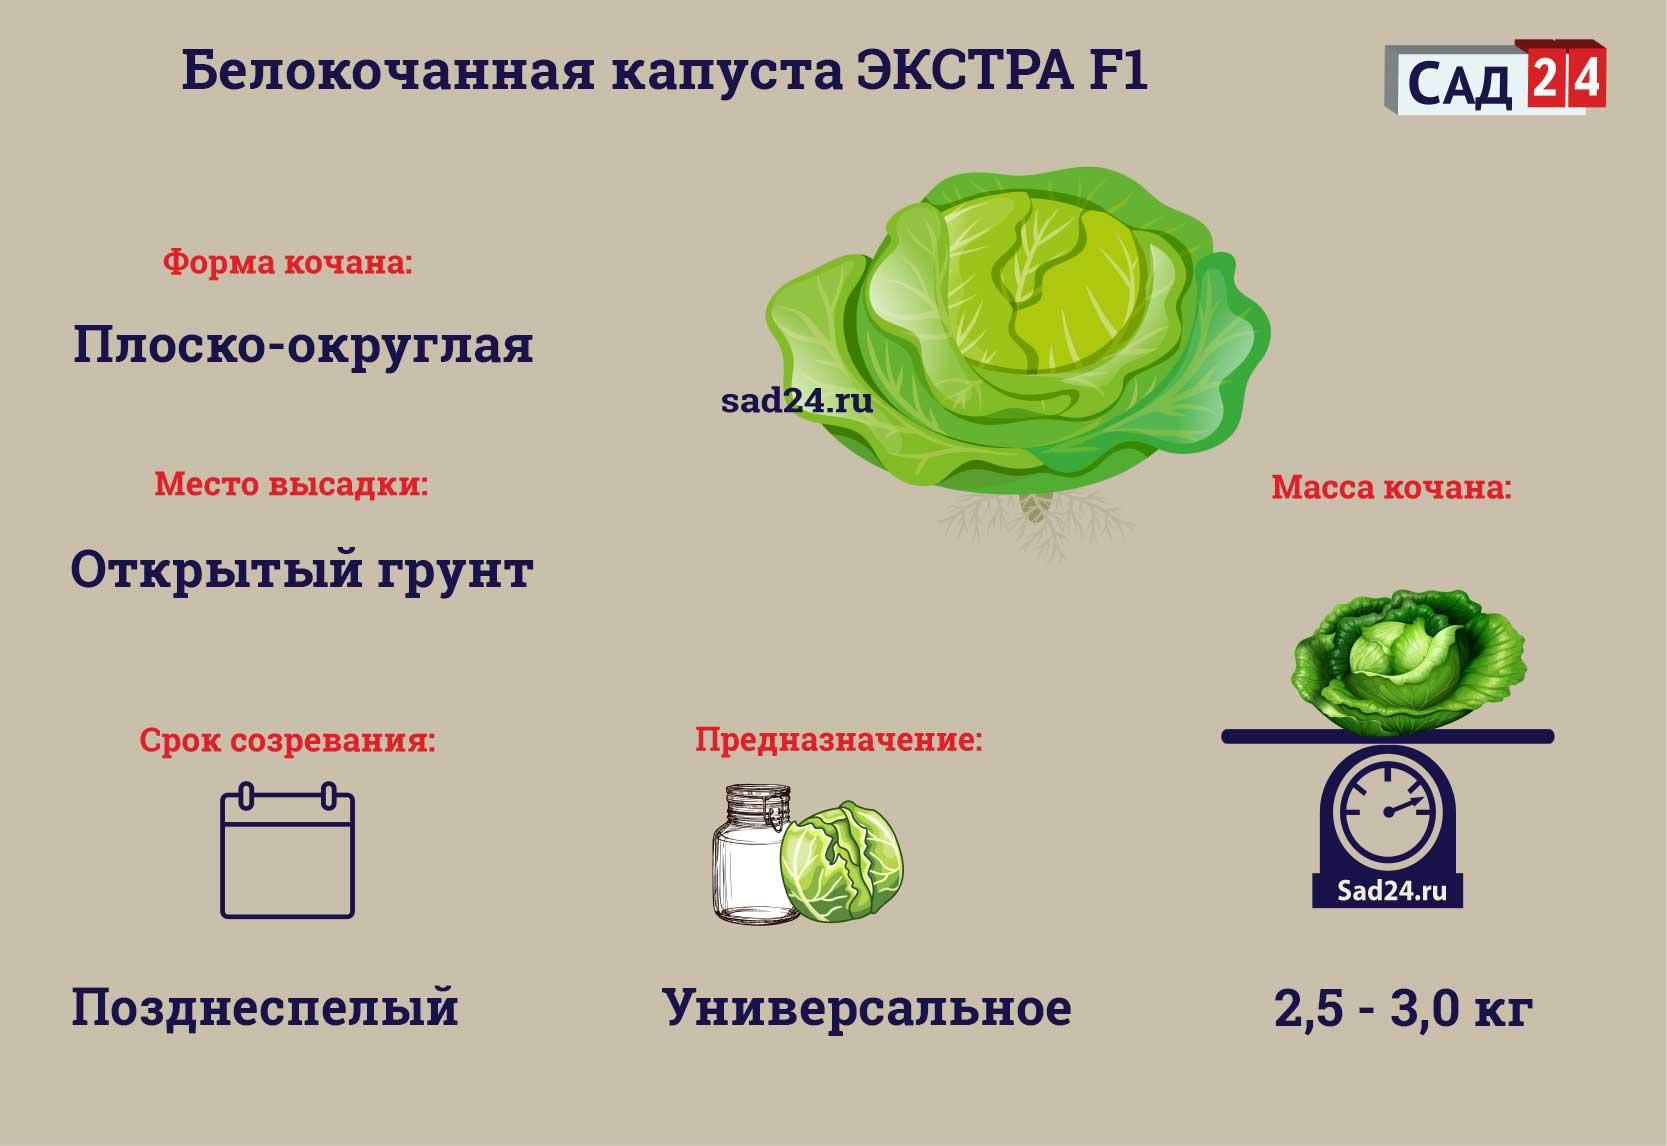 Экстра F1 - https://sad24.ru